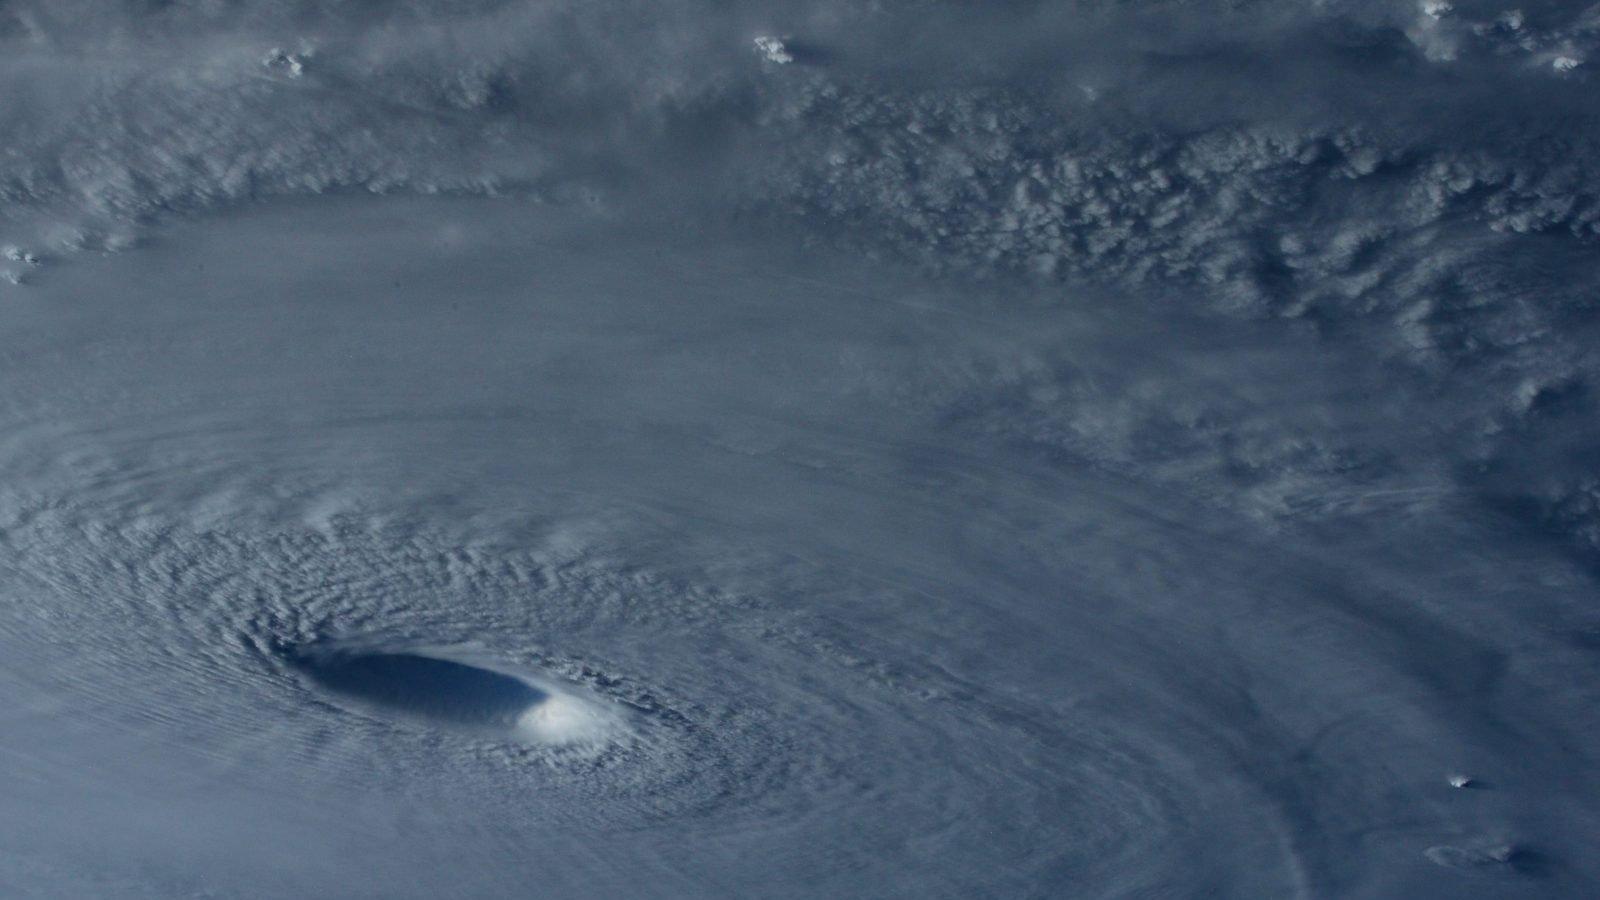 Storme smelter isen på Antarktis